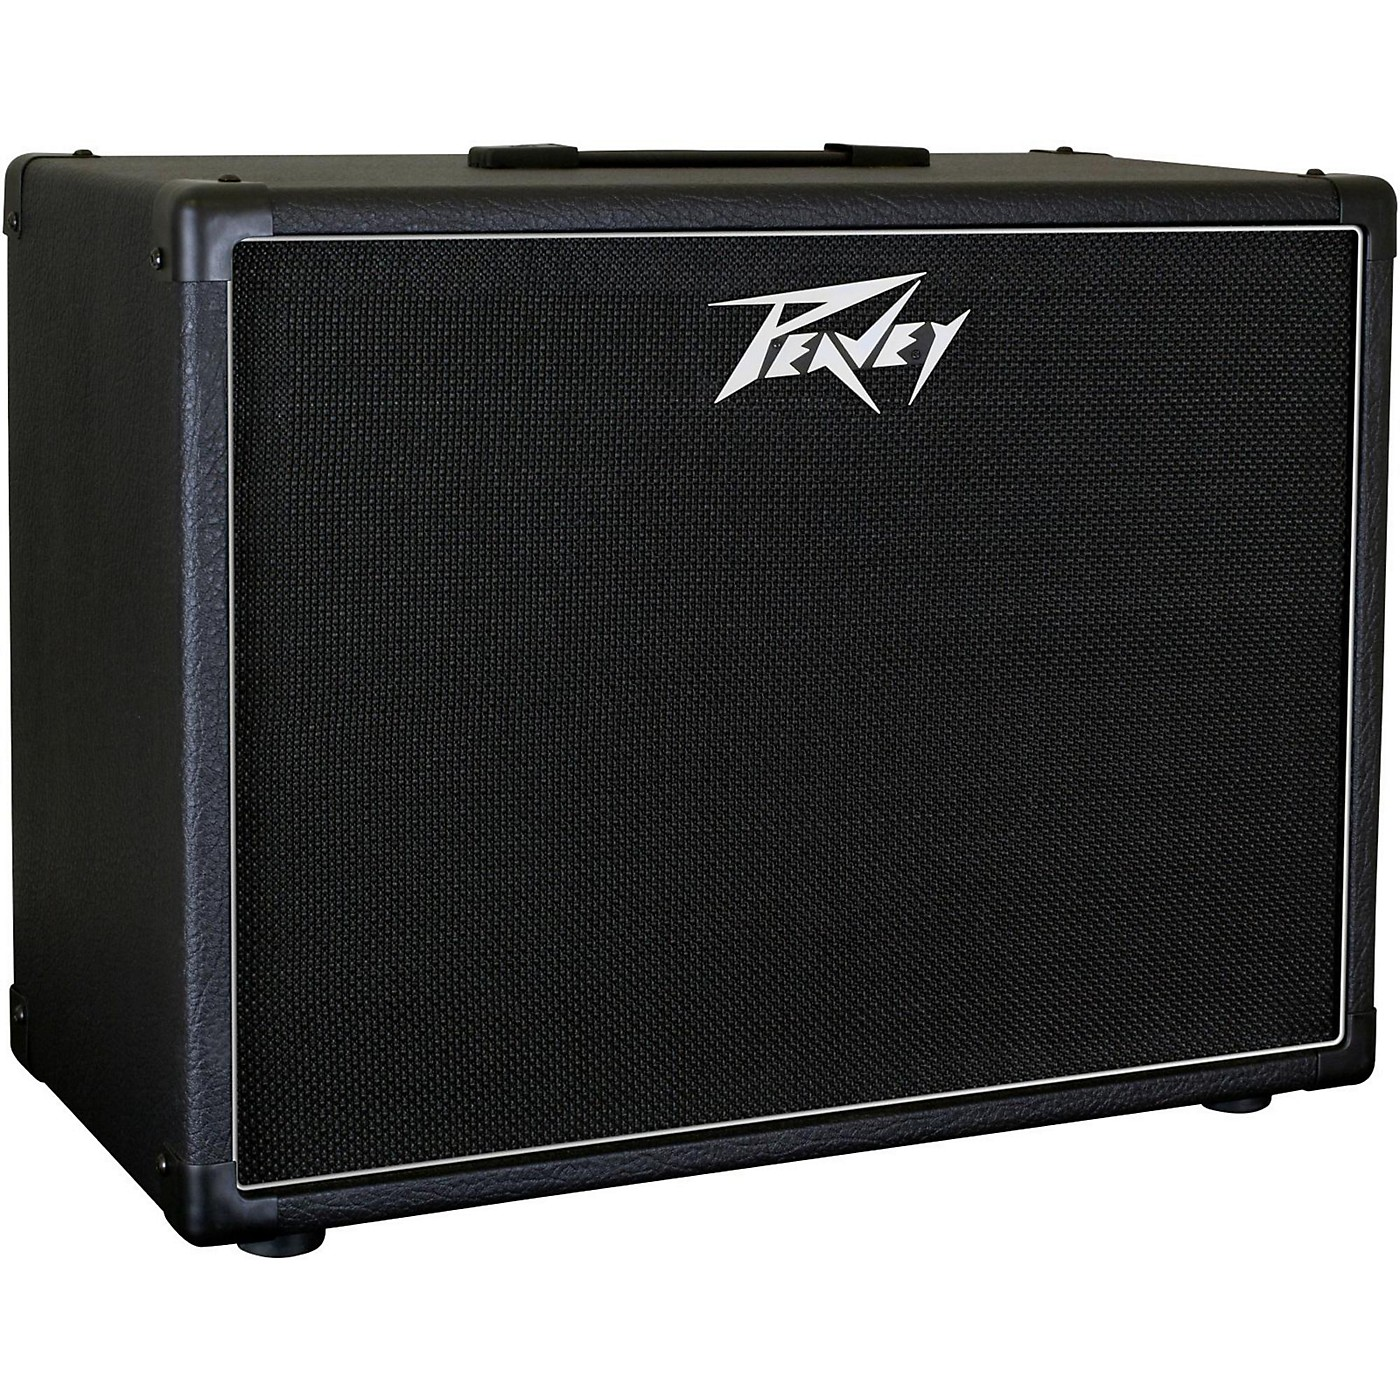 Peavey 112-6 25W 1x12 Guitar Speaker Cabinet thumbnail